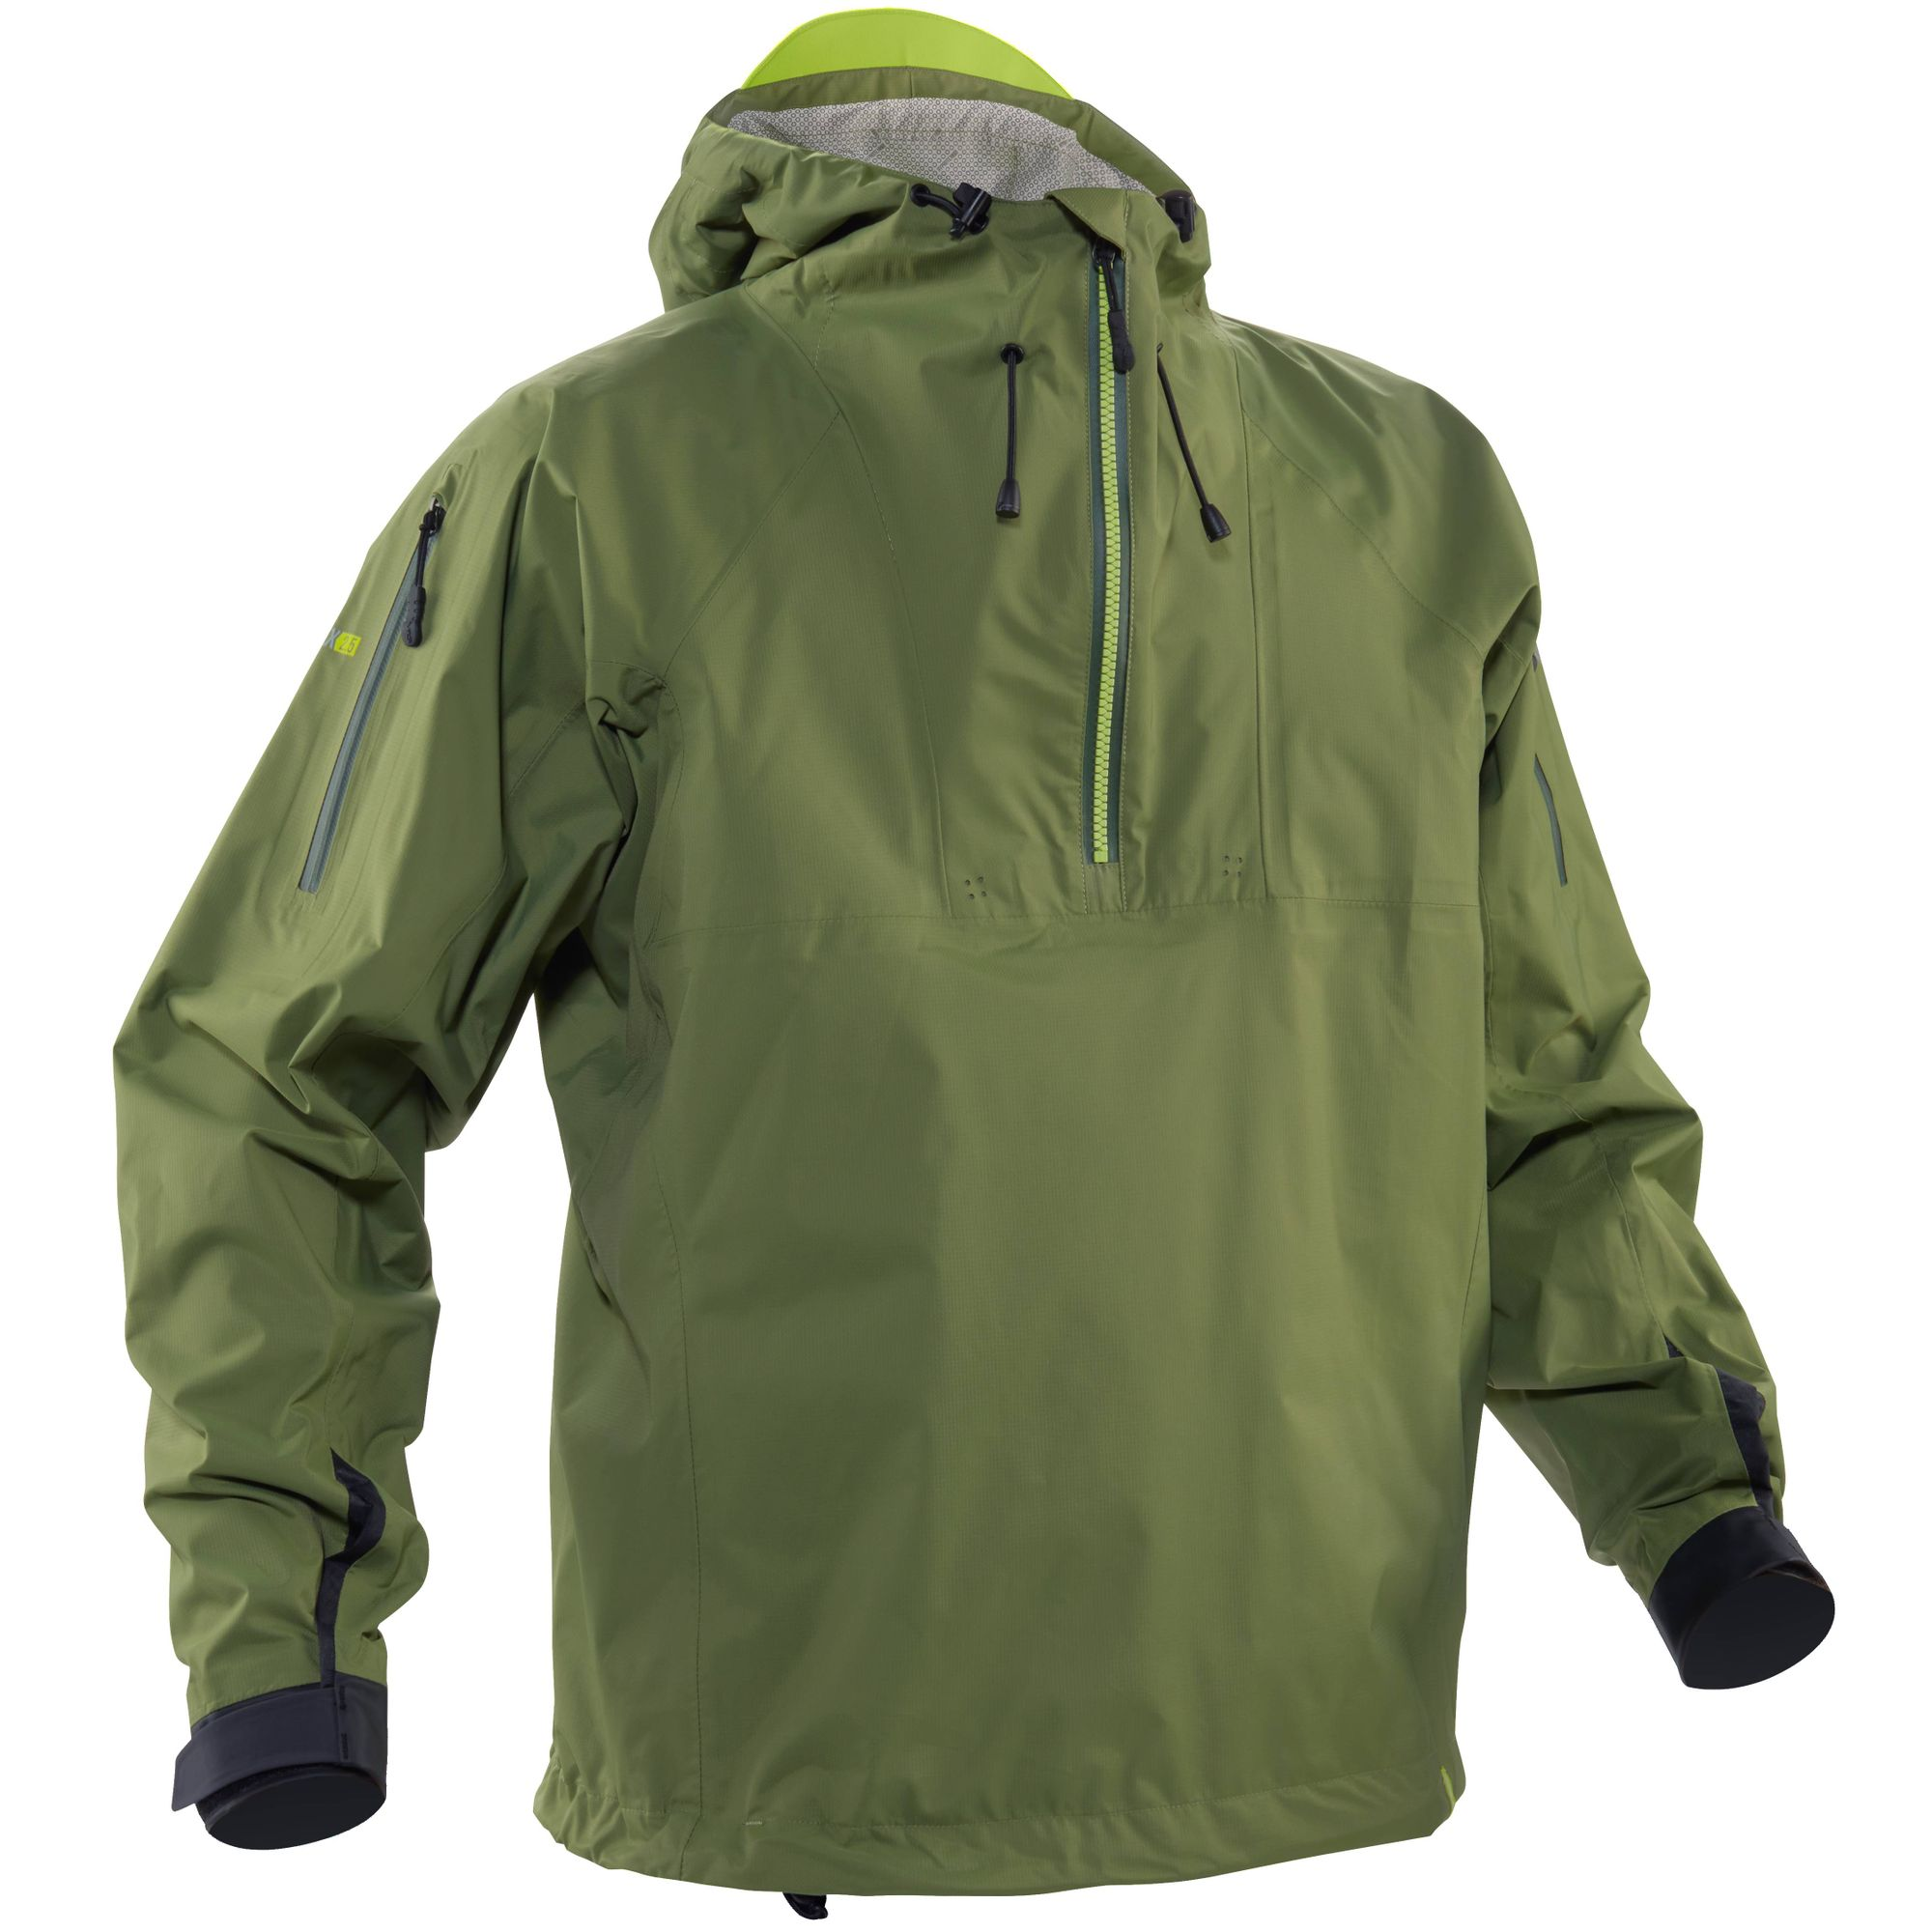 NRS High Tide Jacket, Padlejakke